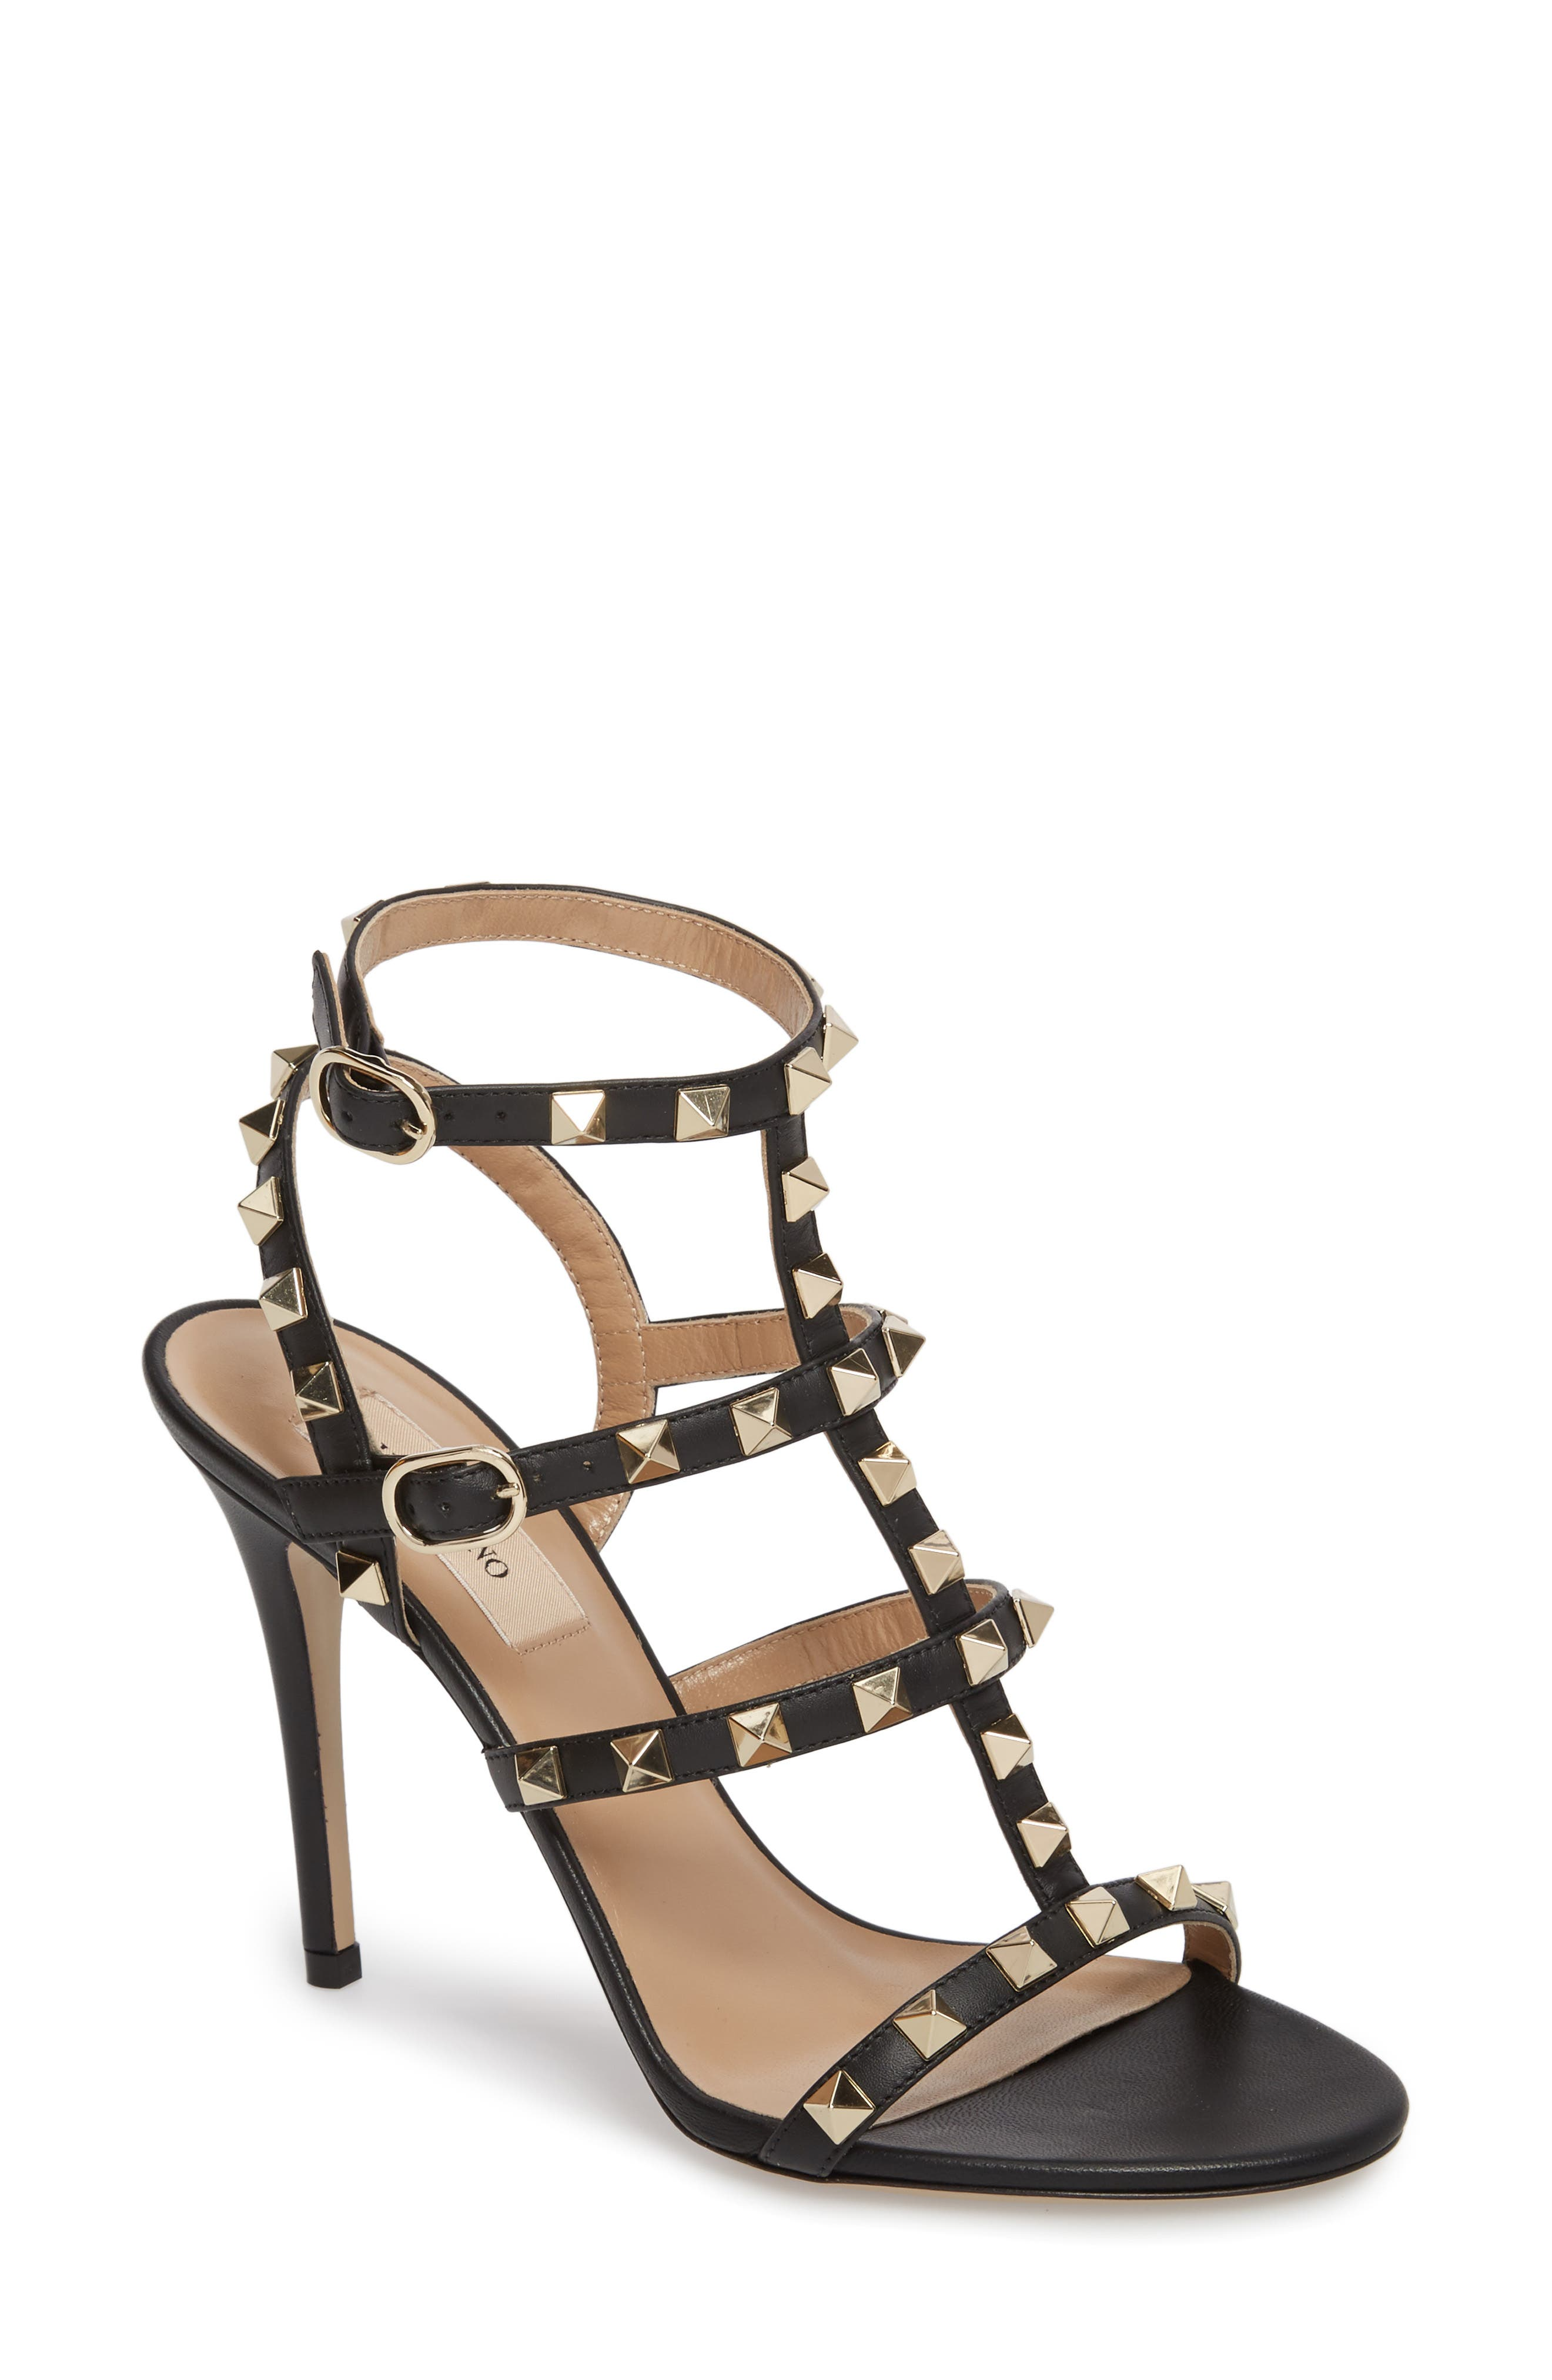 'Rockstud' Ankle Strap Sandal,                             Main thumbnail 1, color,                             001